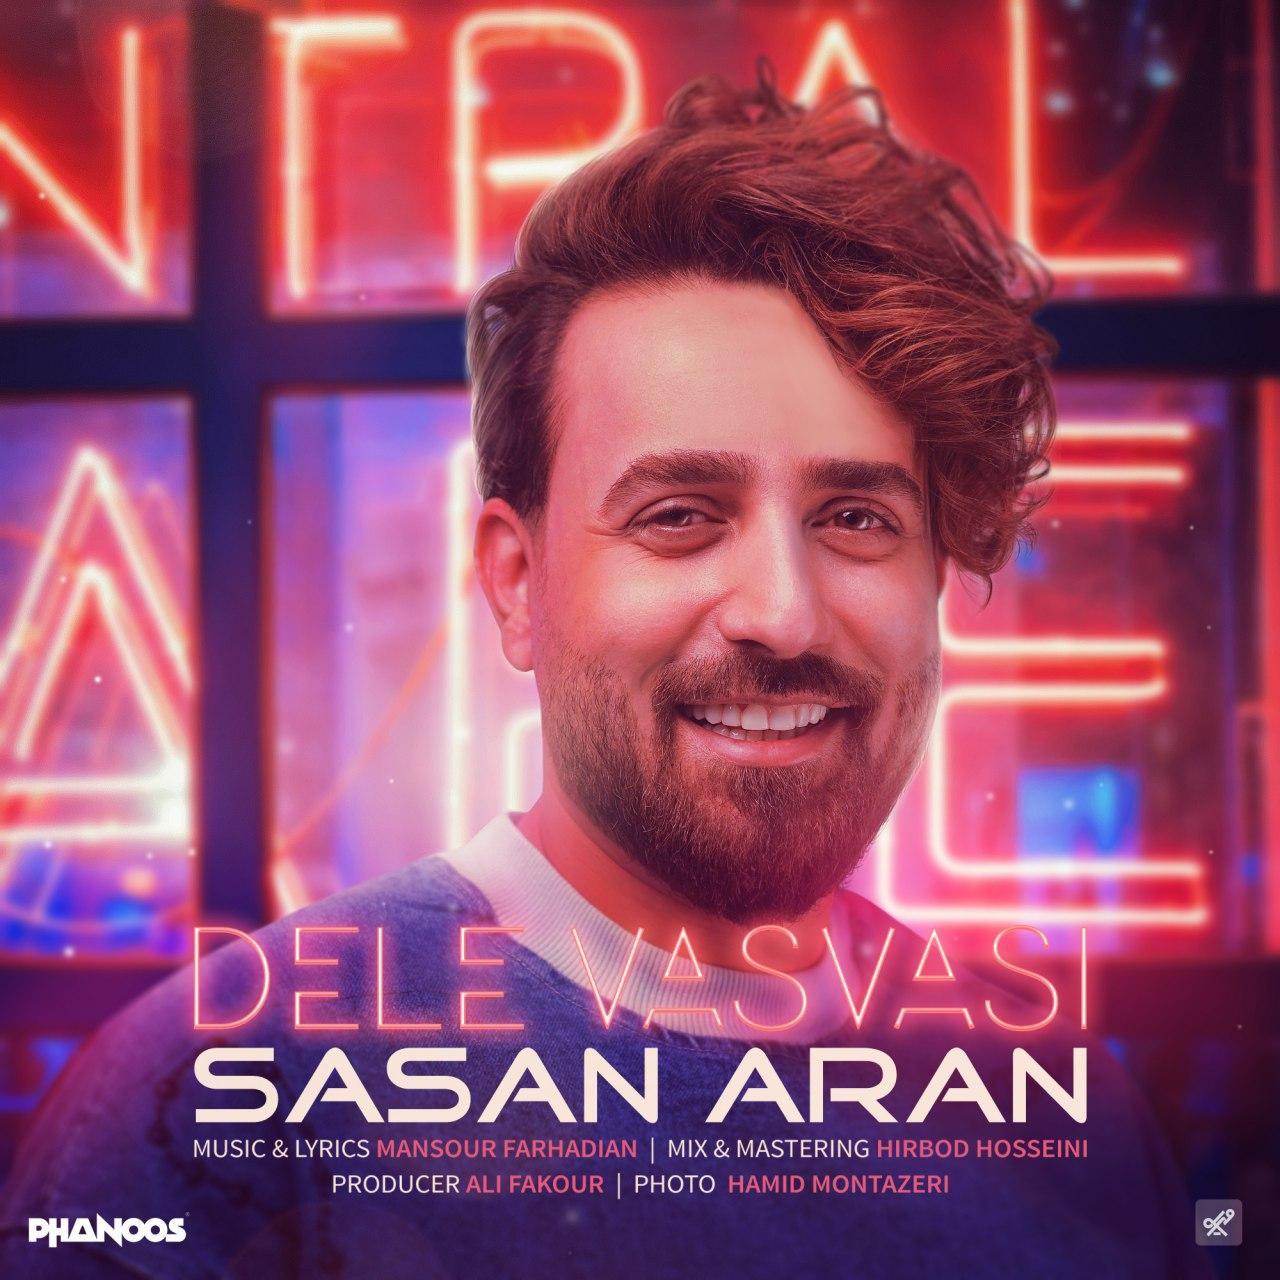 Sasan Aran – Dele Vasvasi